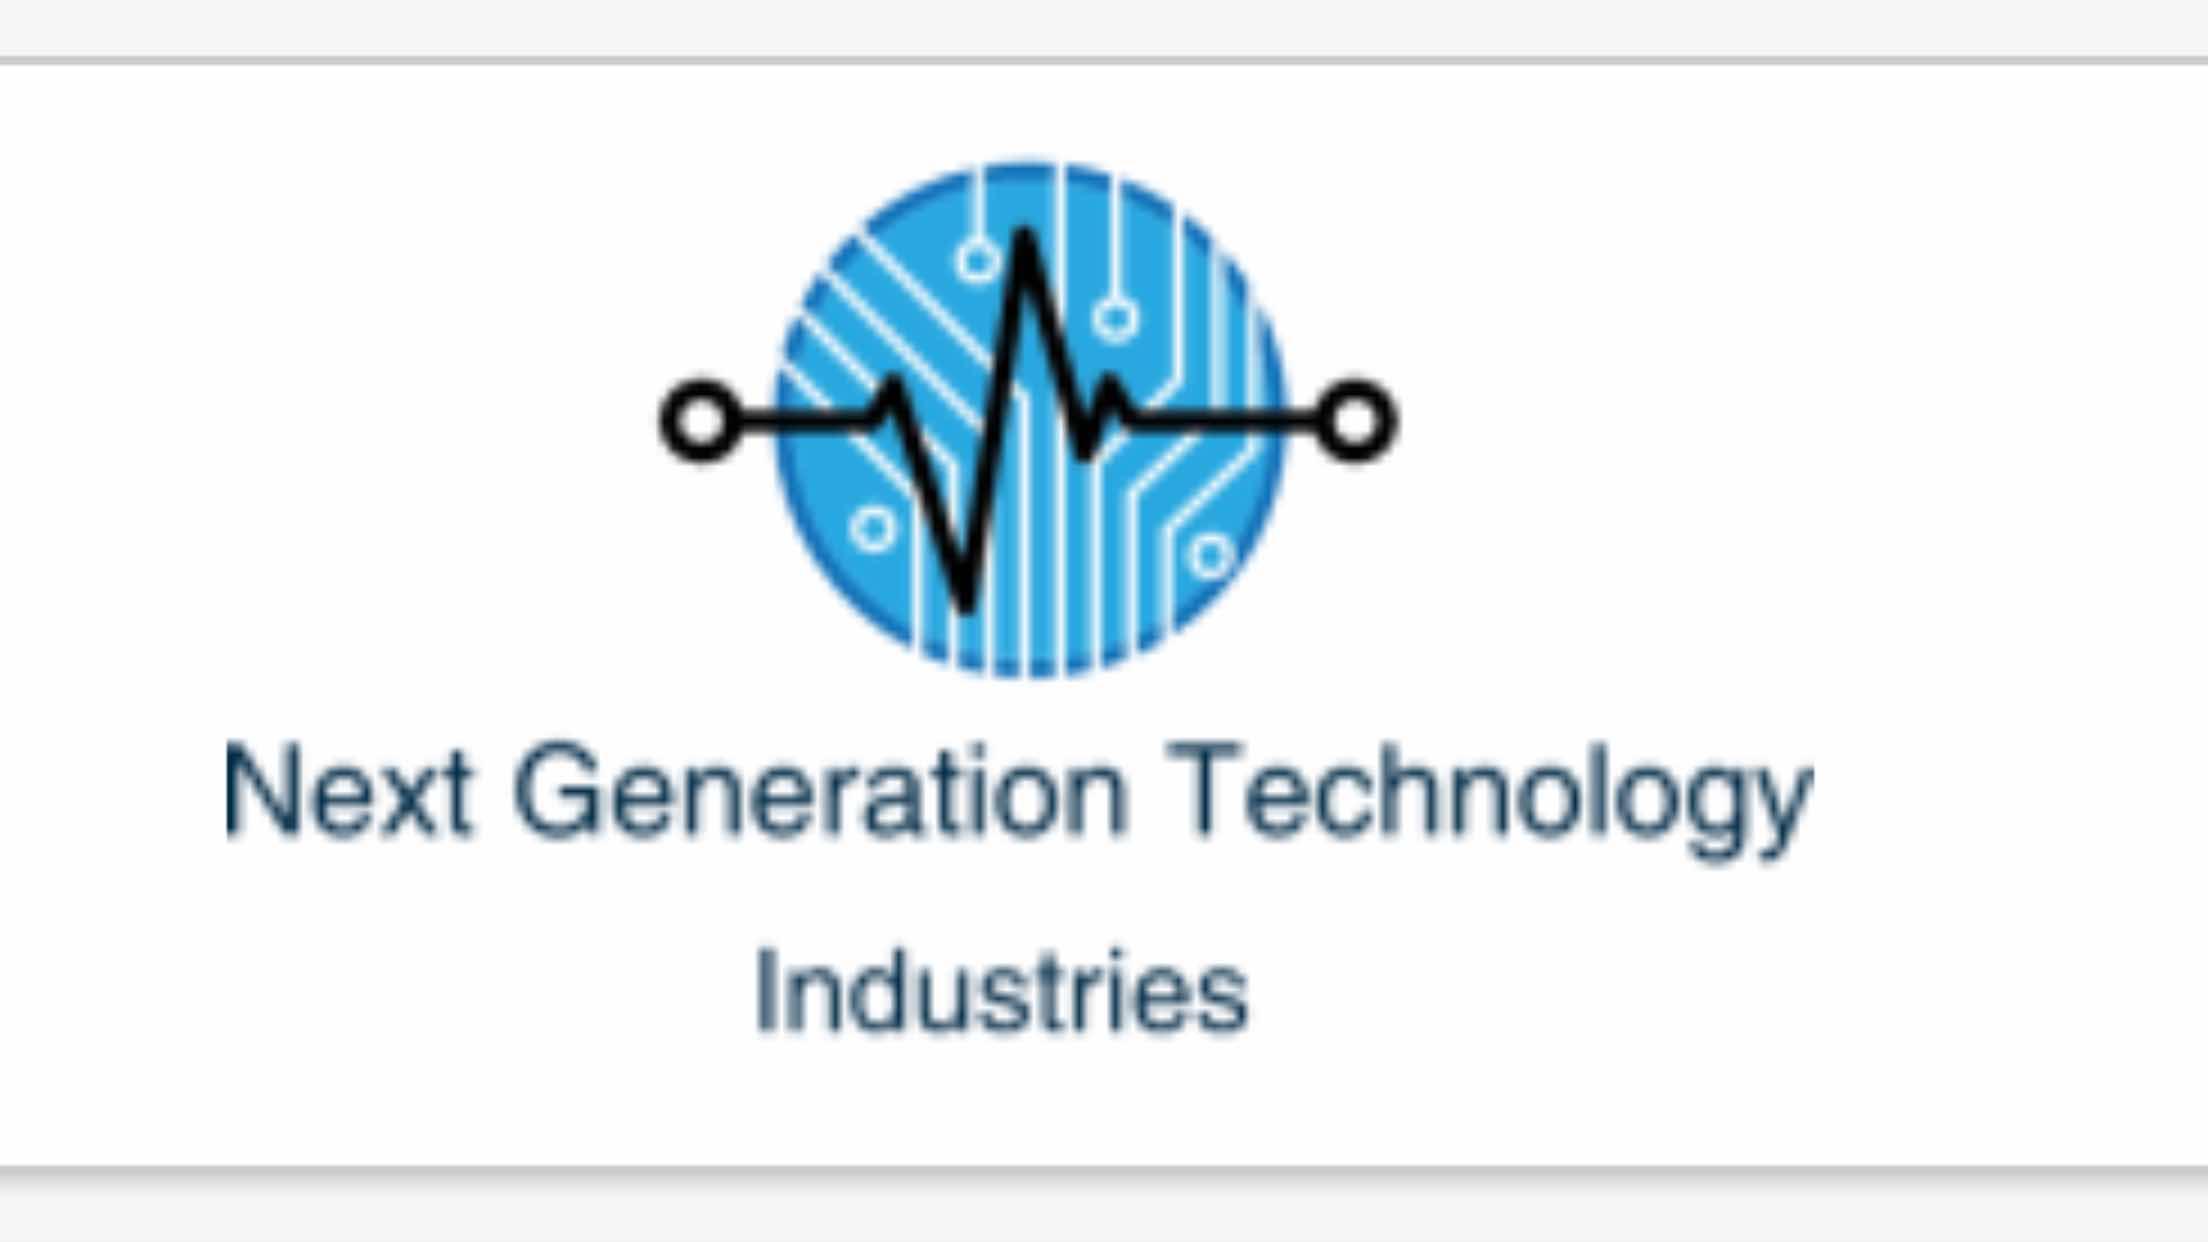 Next Generation Technical Industries